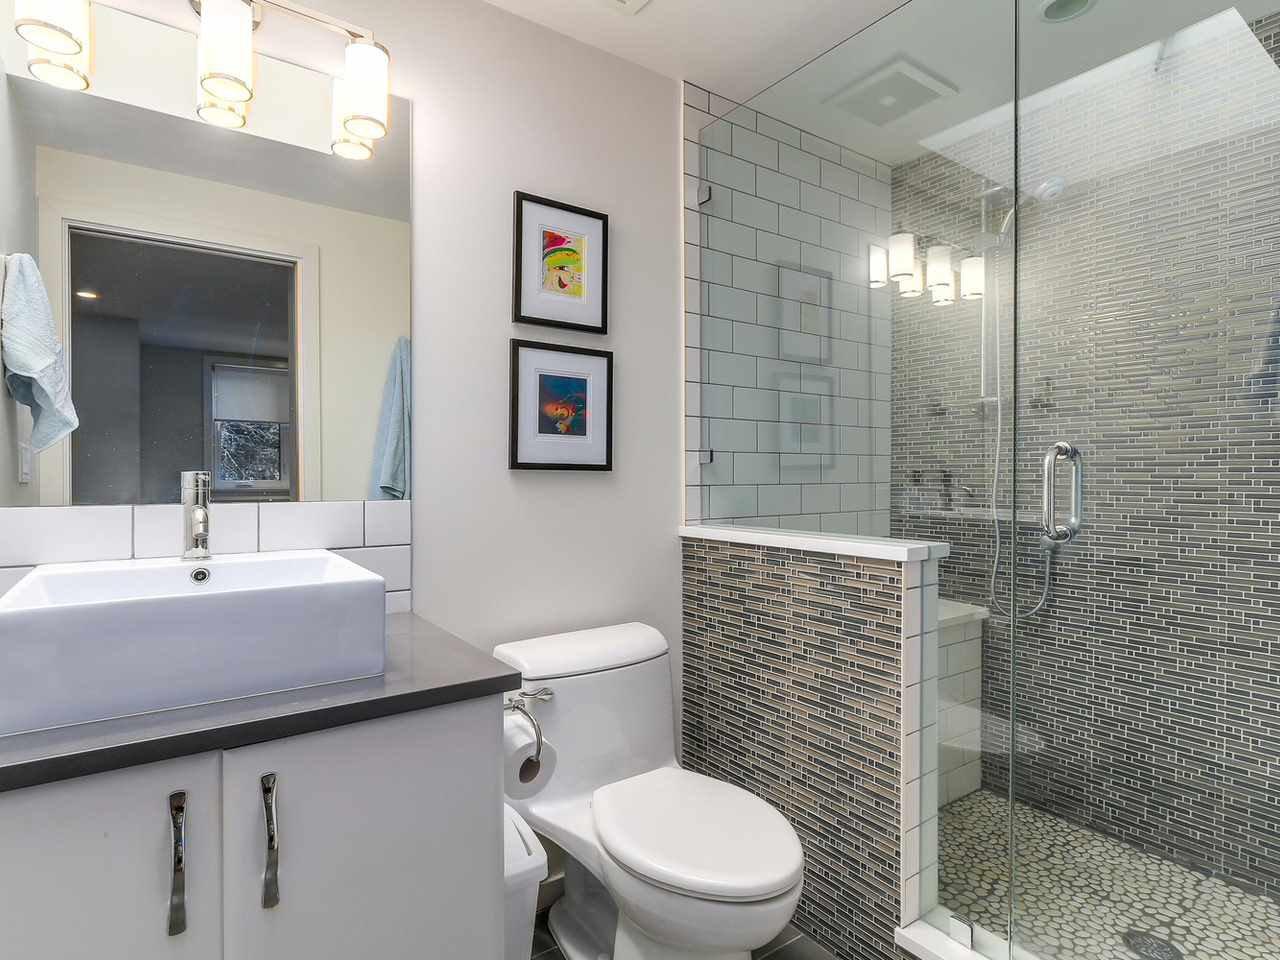 Photo 20: Photos: 3708 EDGEMONT Boulevard in North Vancouver: Edgemont House Fourplex for sale : MLS®# R2138514